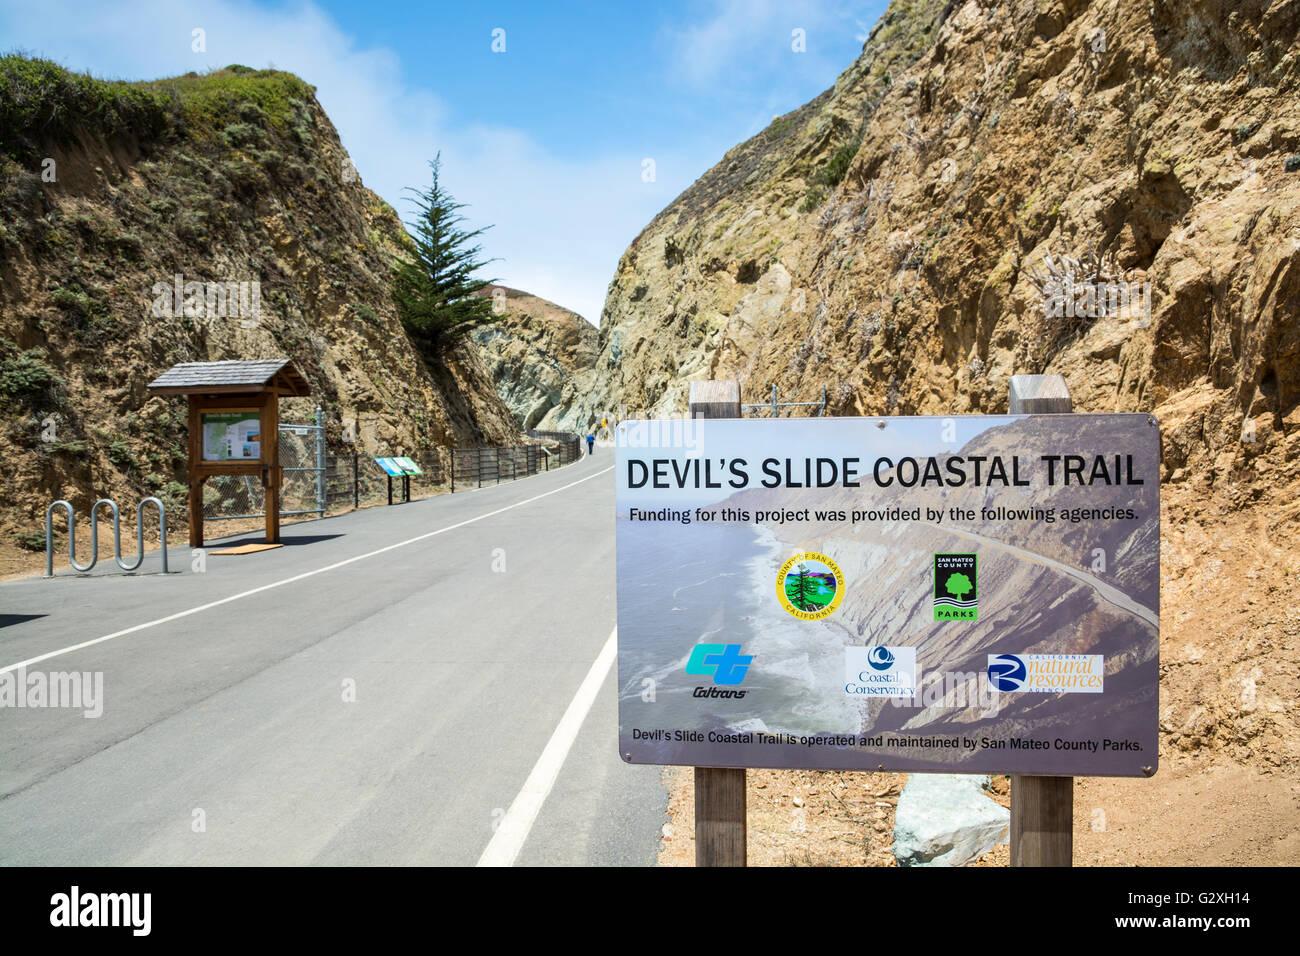 California san mateo county pescadero - California San Mateo County Pacific Ocean Coast Devil S Slide Coastal Trail Stock